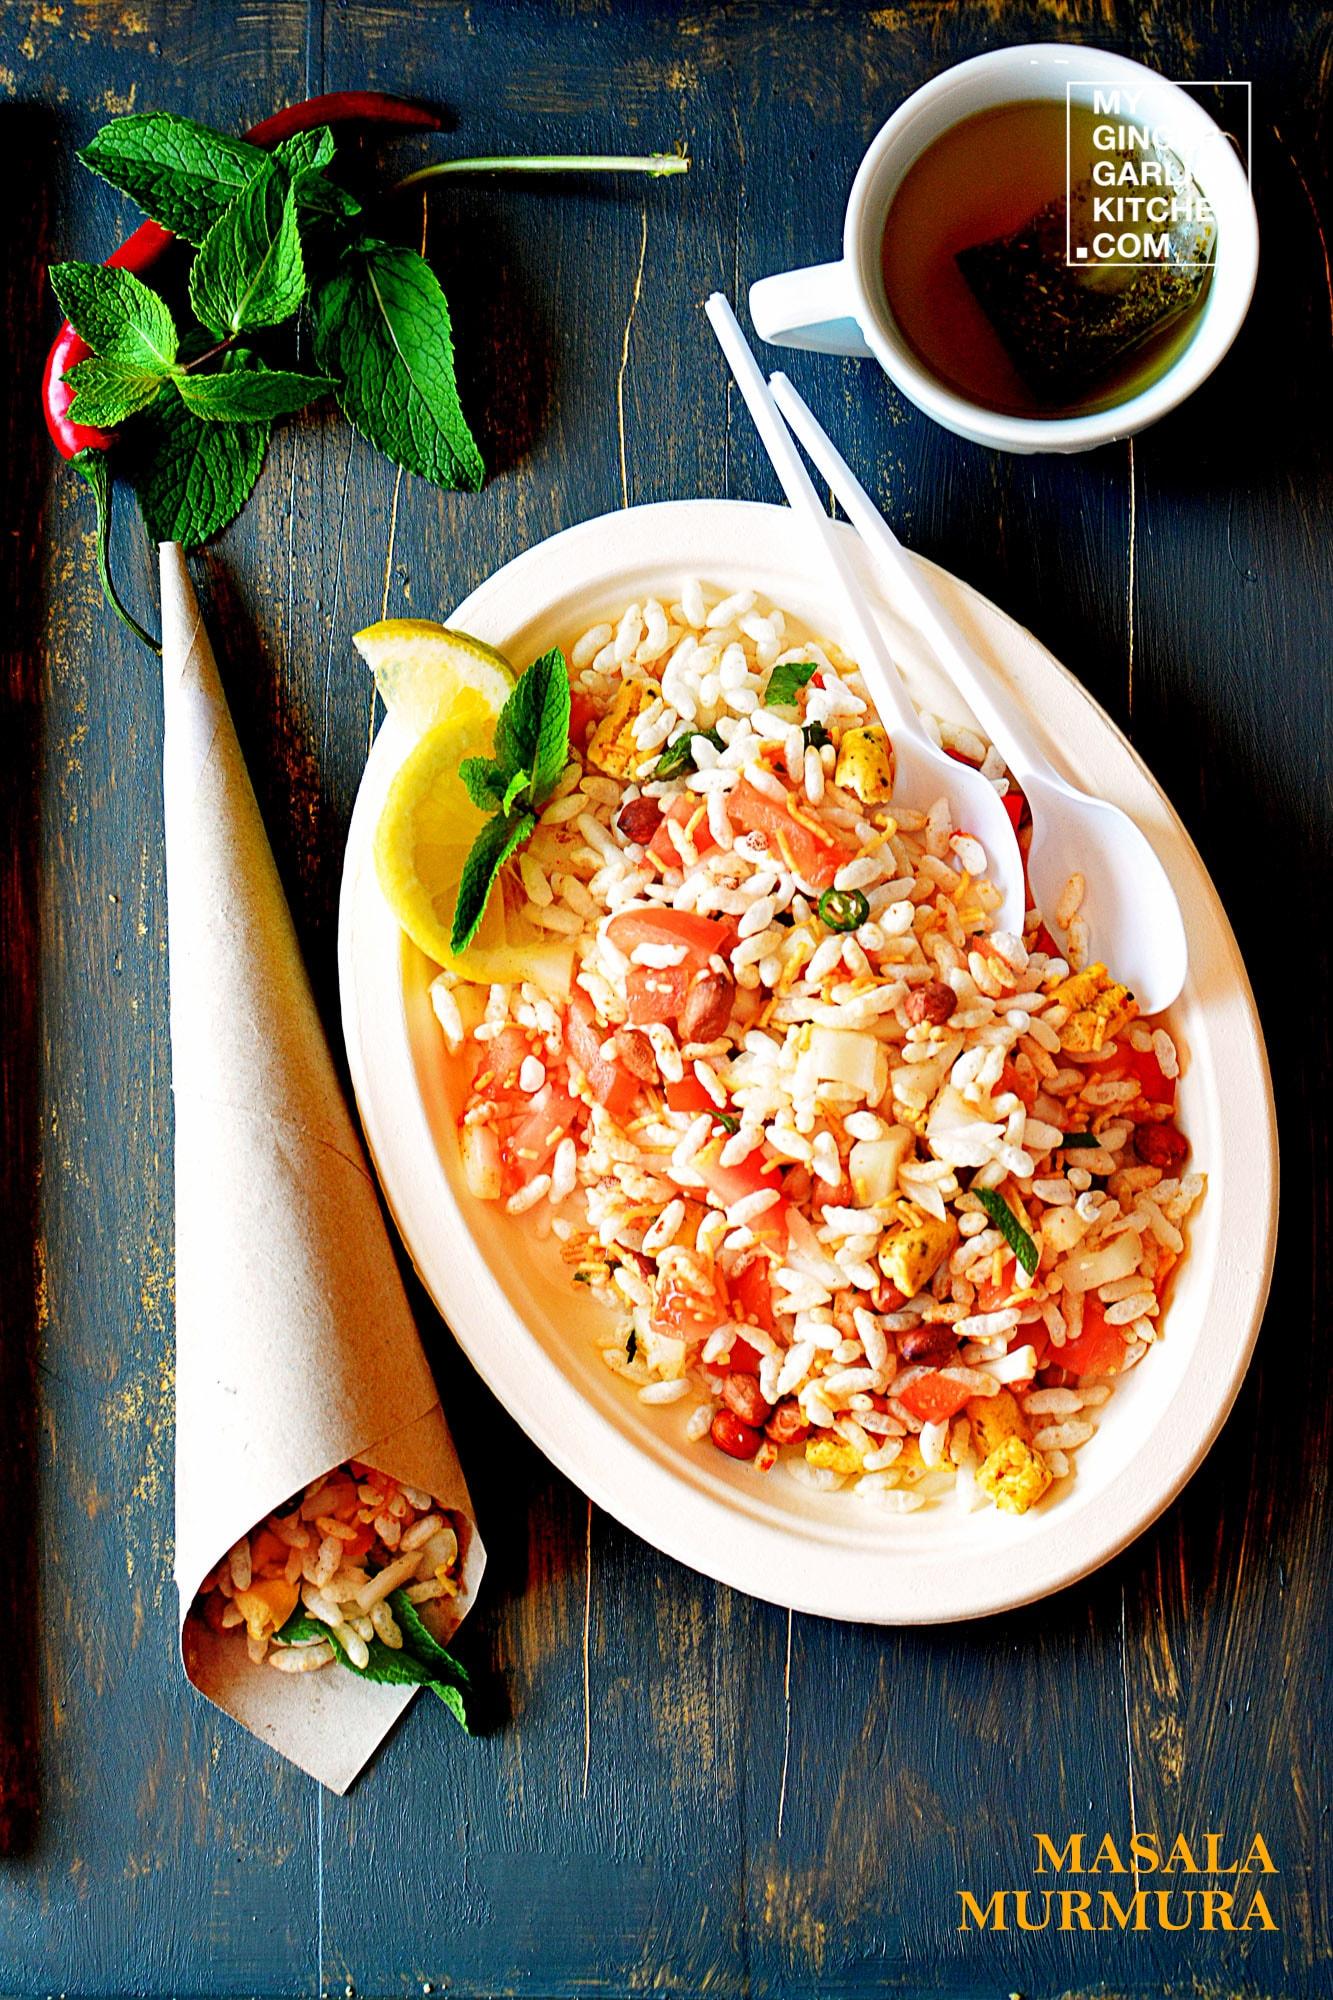 Image - recipe masala murmura anupama paliwal my ginger garlic kitchen 3